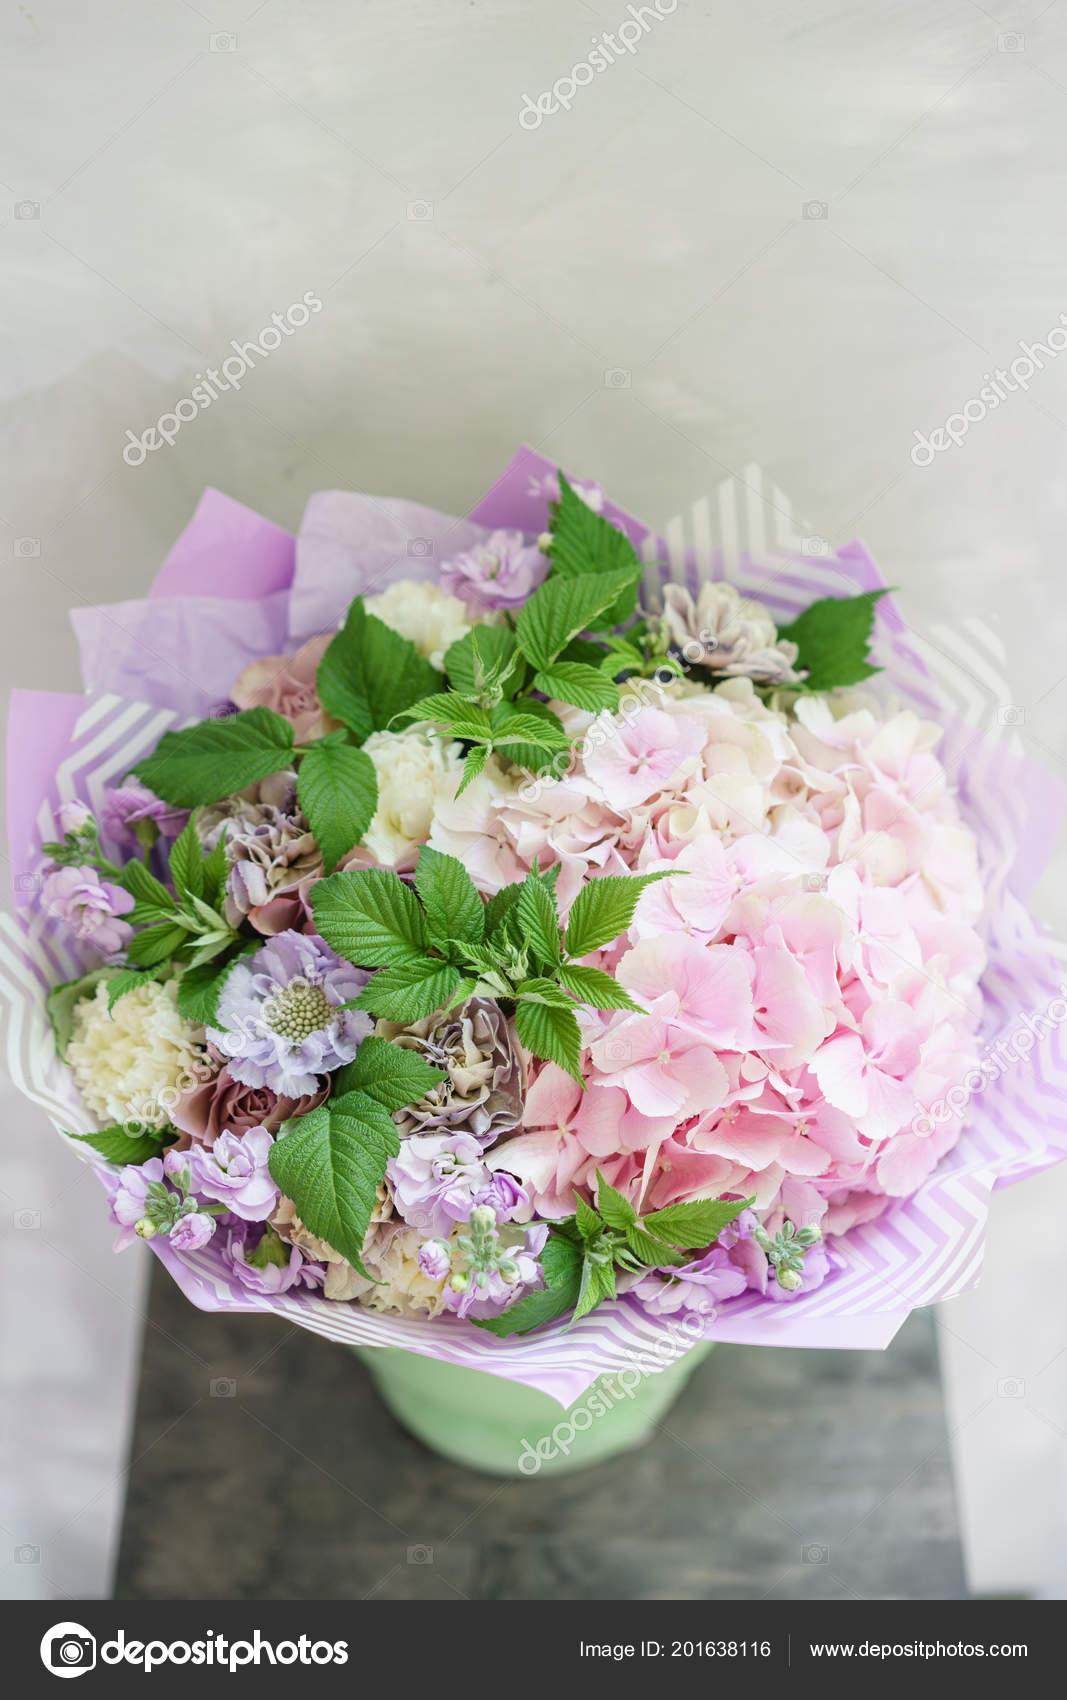 Work Florist Beautiful Spring Bouquet Arrangement With Mix Flowers